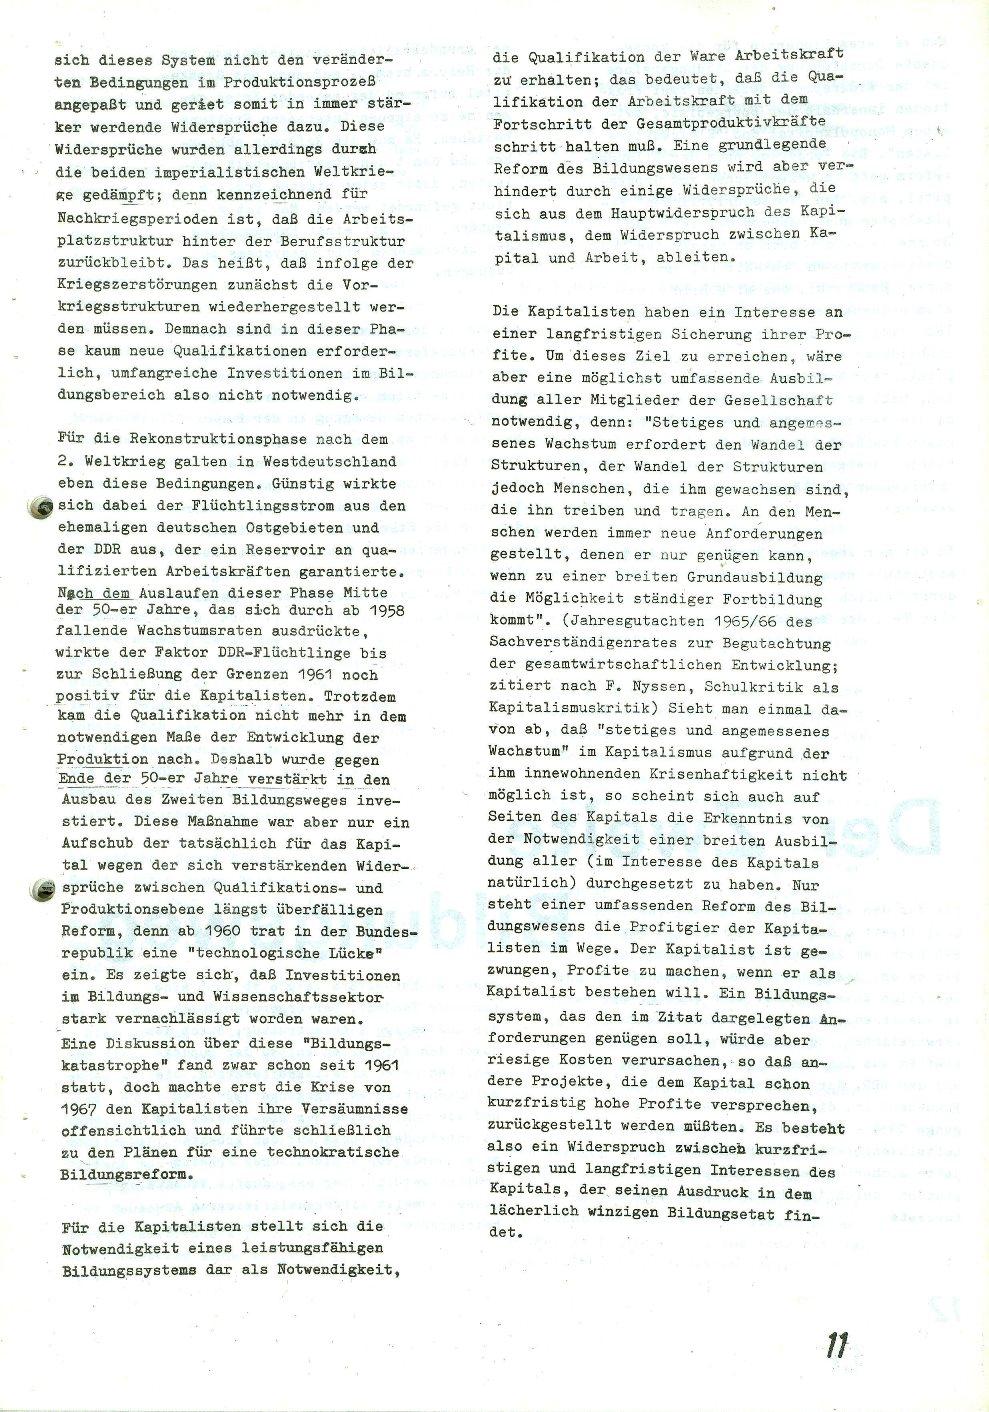 Oldenburg_KBW065